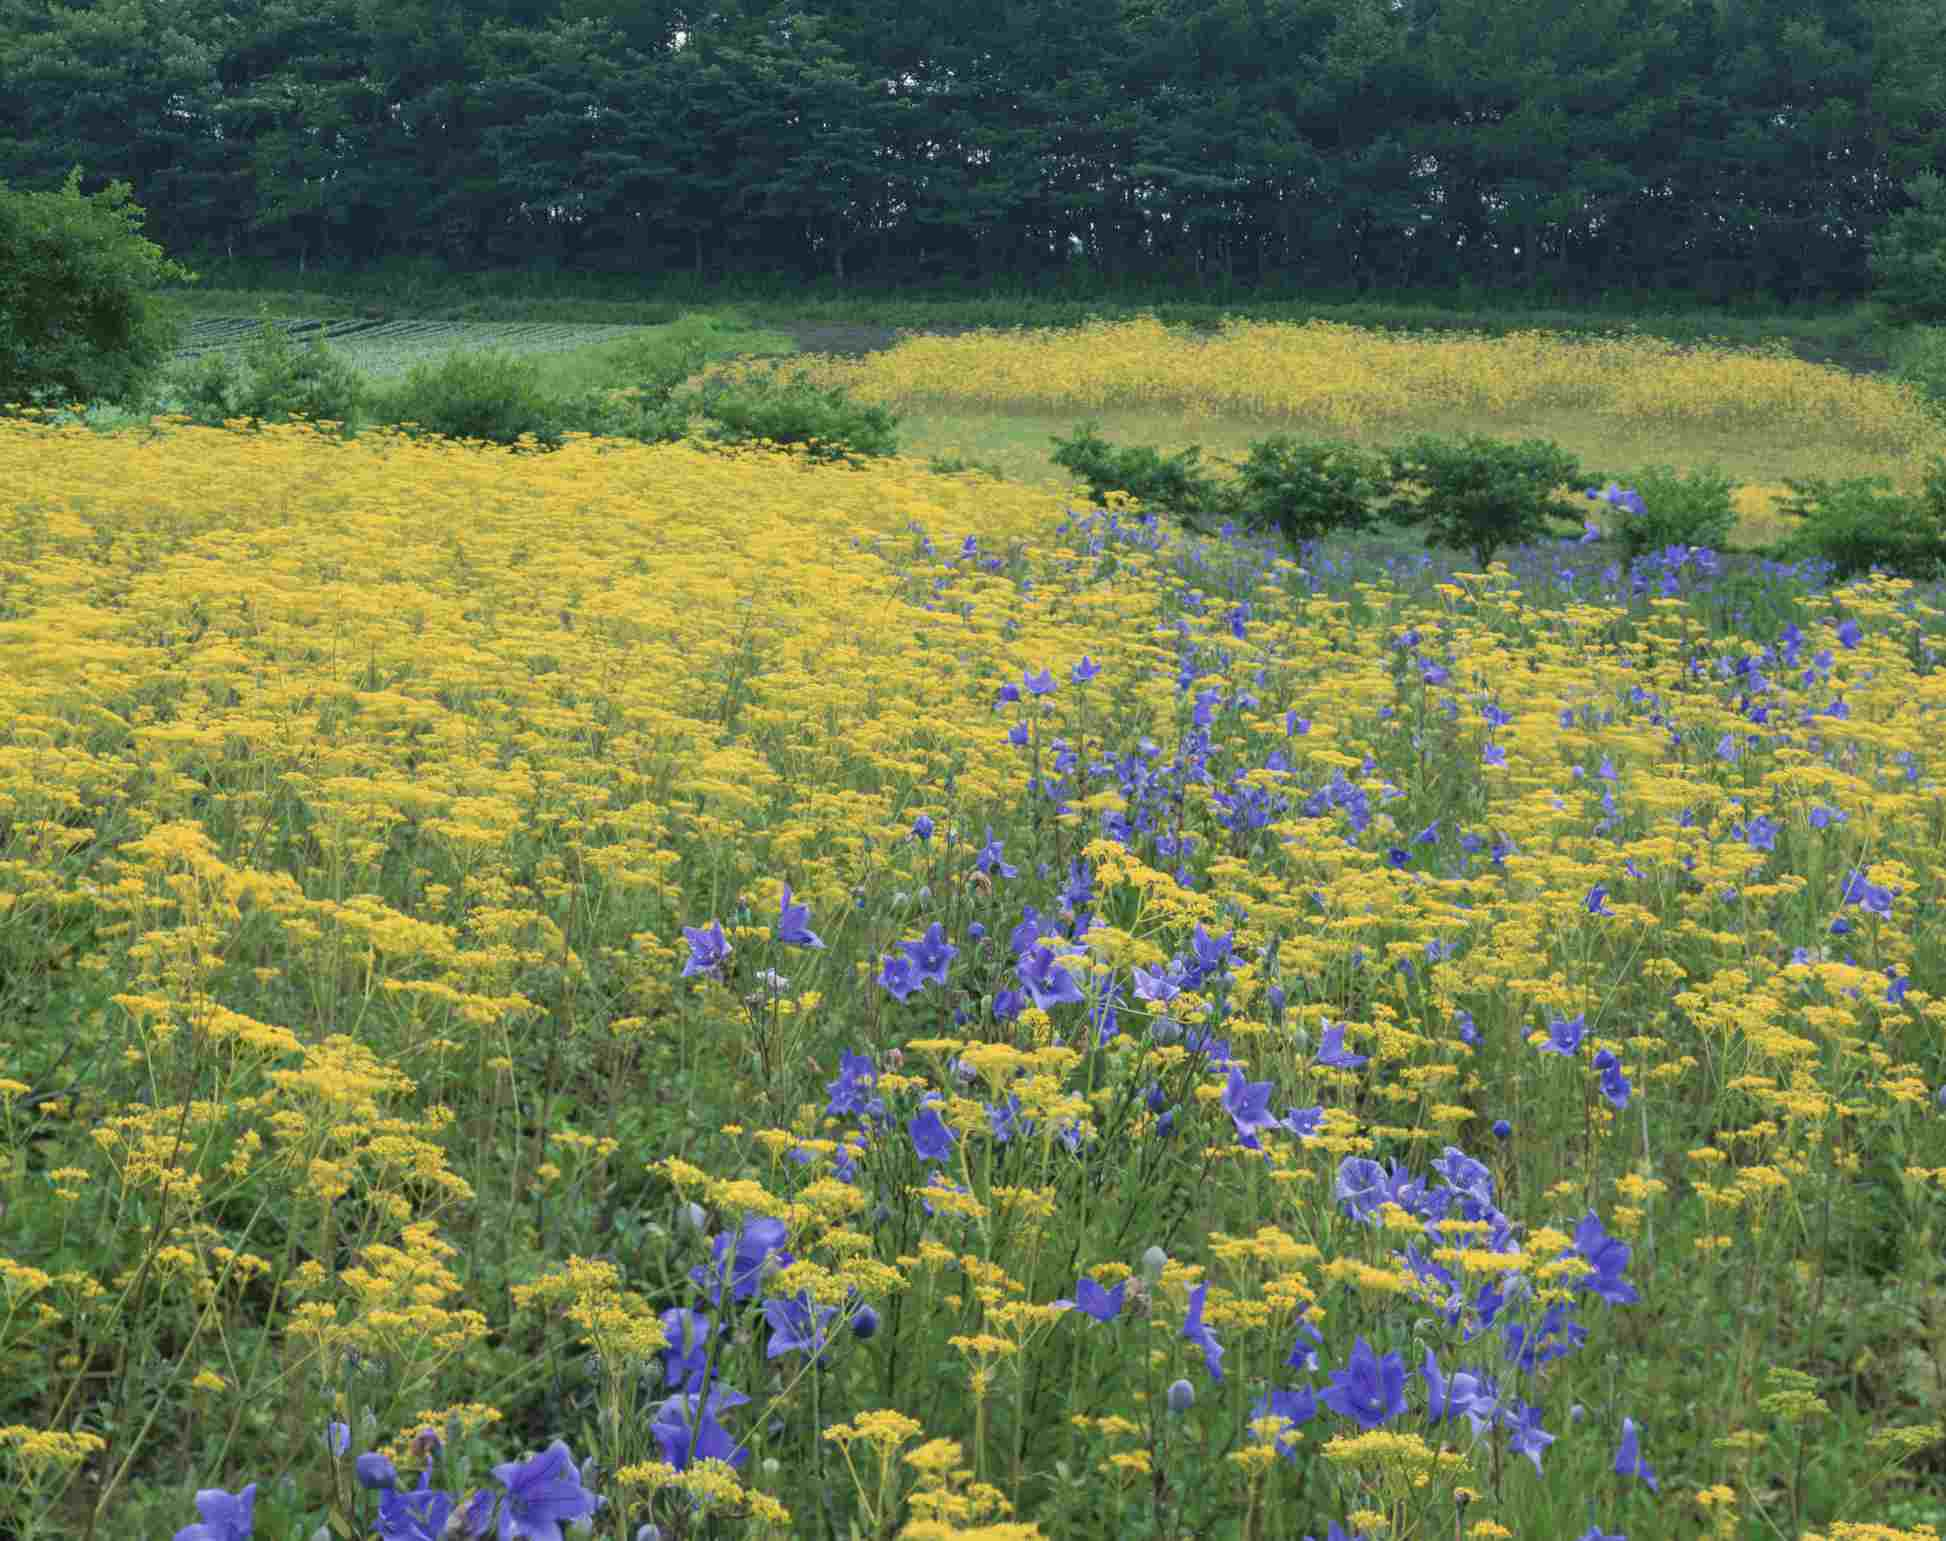 Japan, Nagano Prefecture, Balloon Flowers (Platycodon grandiflorus) and Golden Lace (Patrinia scabiosifolia) flowers